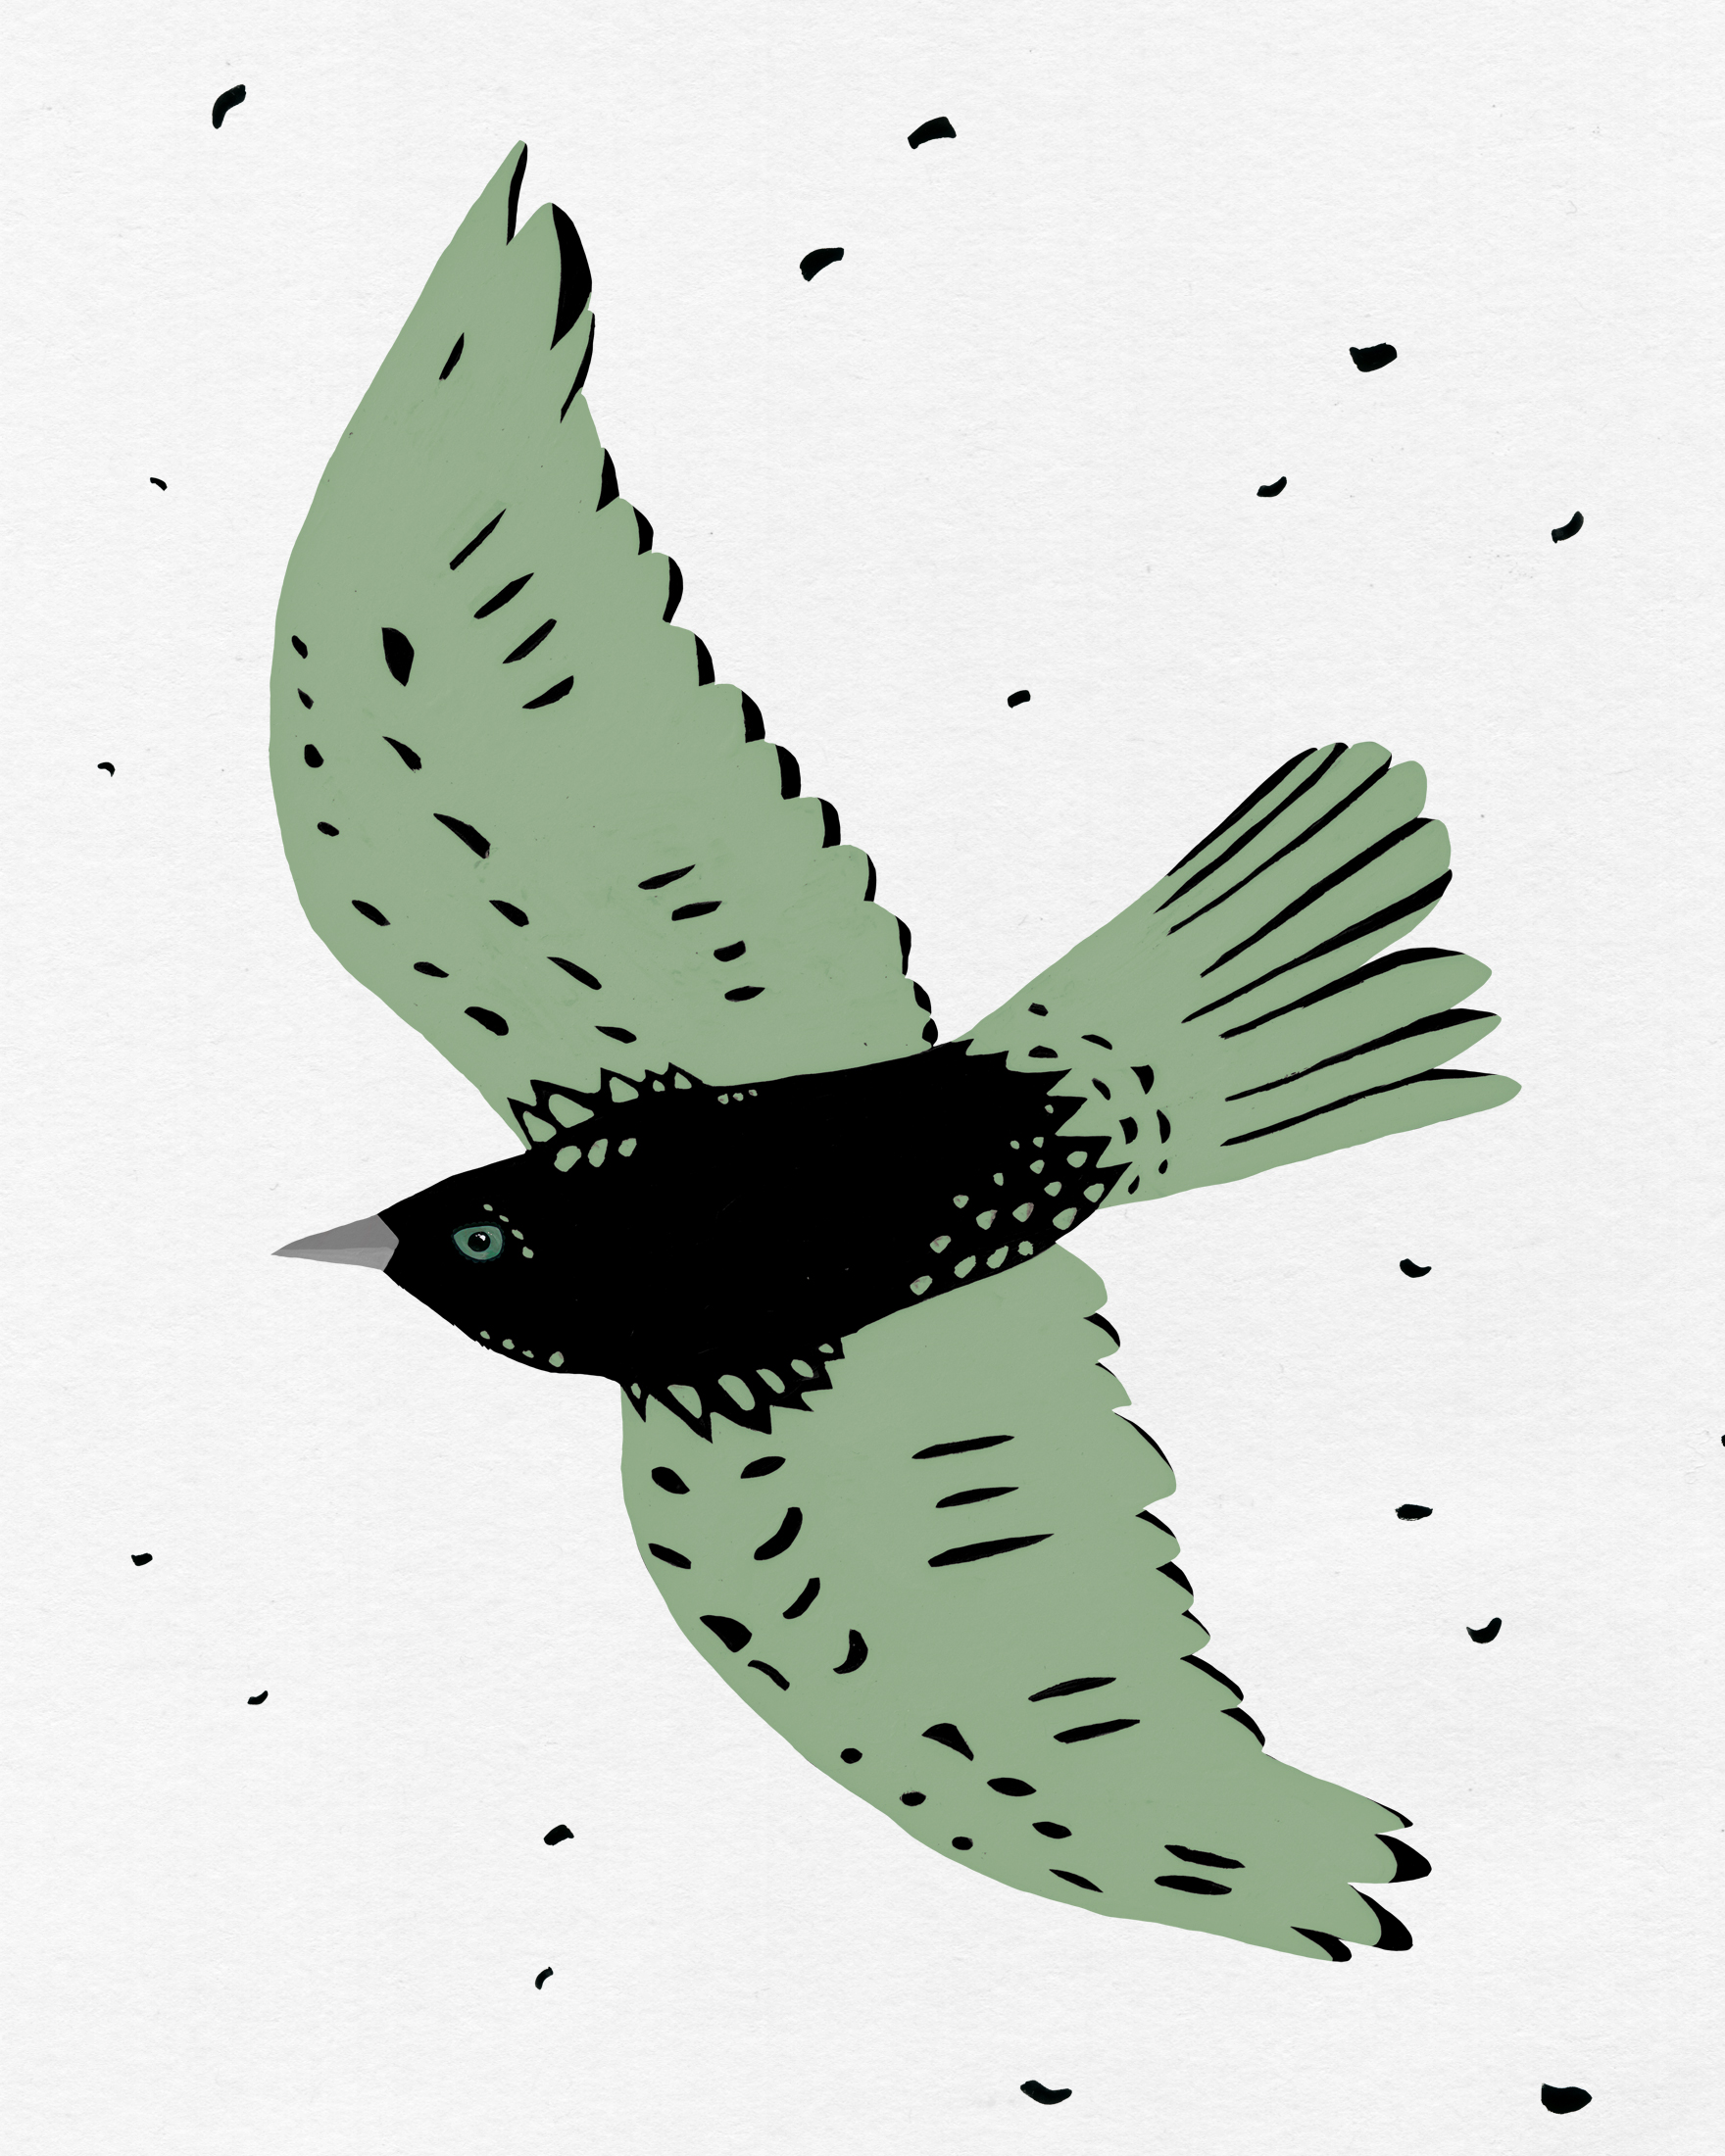 patterned bird series - free bird